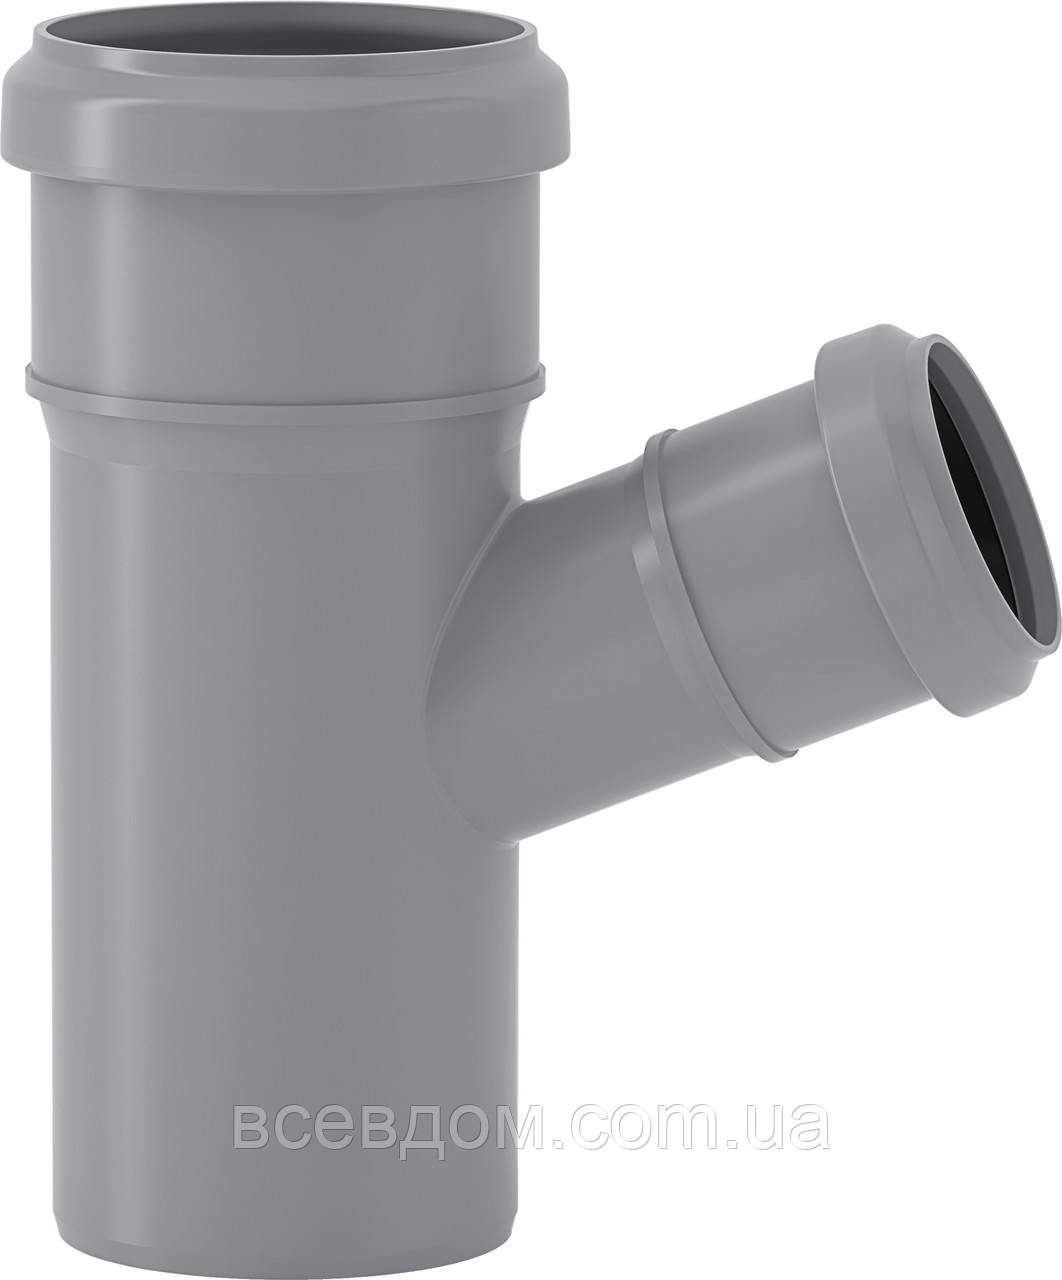 HTEA тройник Valsir внутренней канализации 110/50х45°